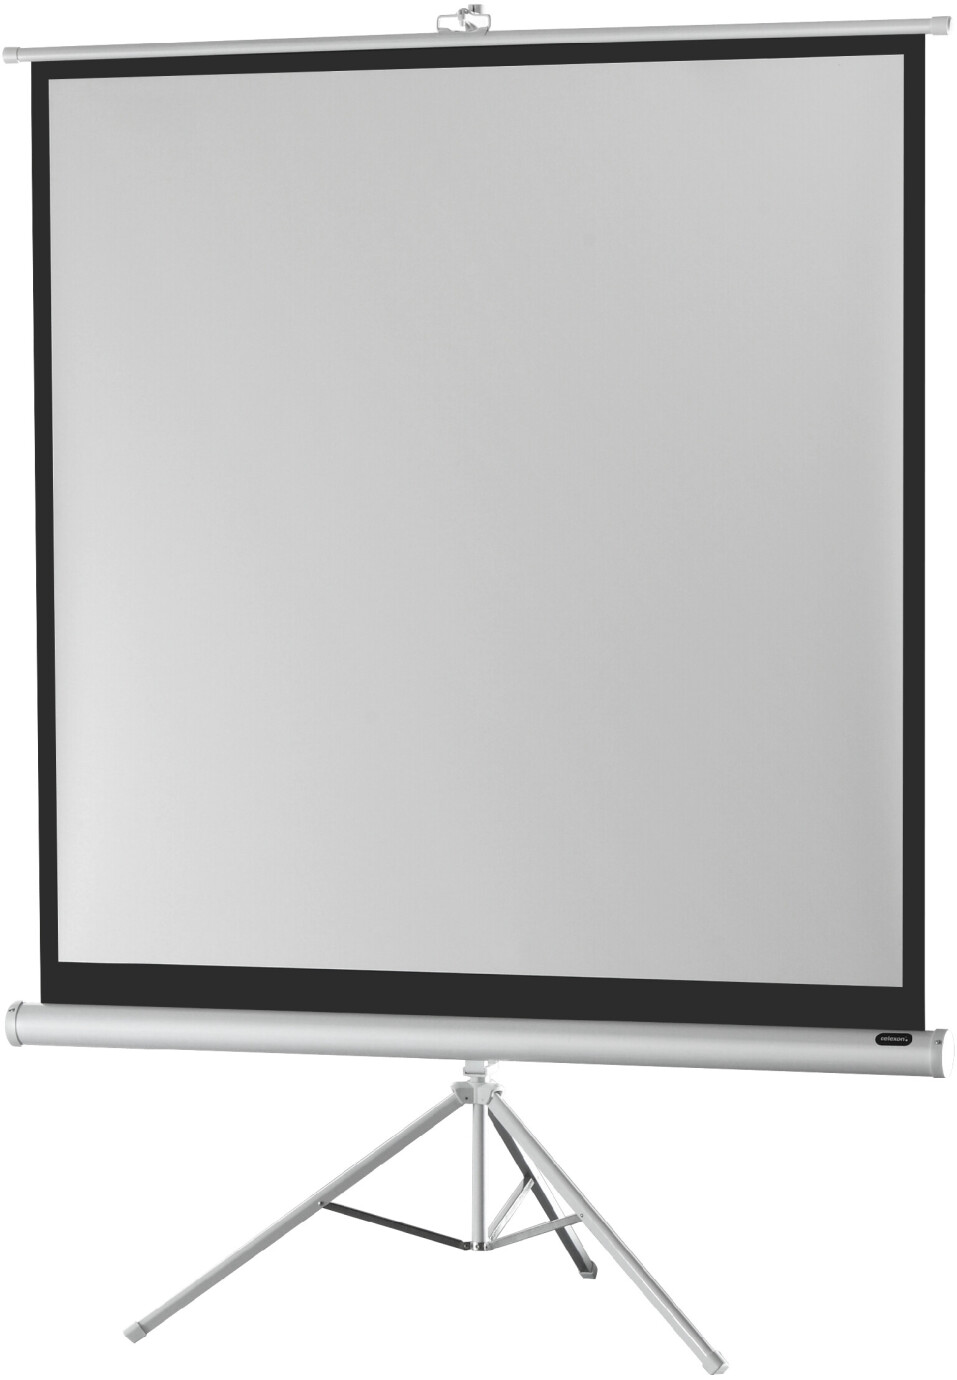 celexon screen Tripod Economy 184 x 184 cm - White Edition